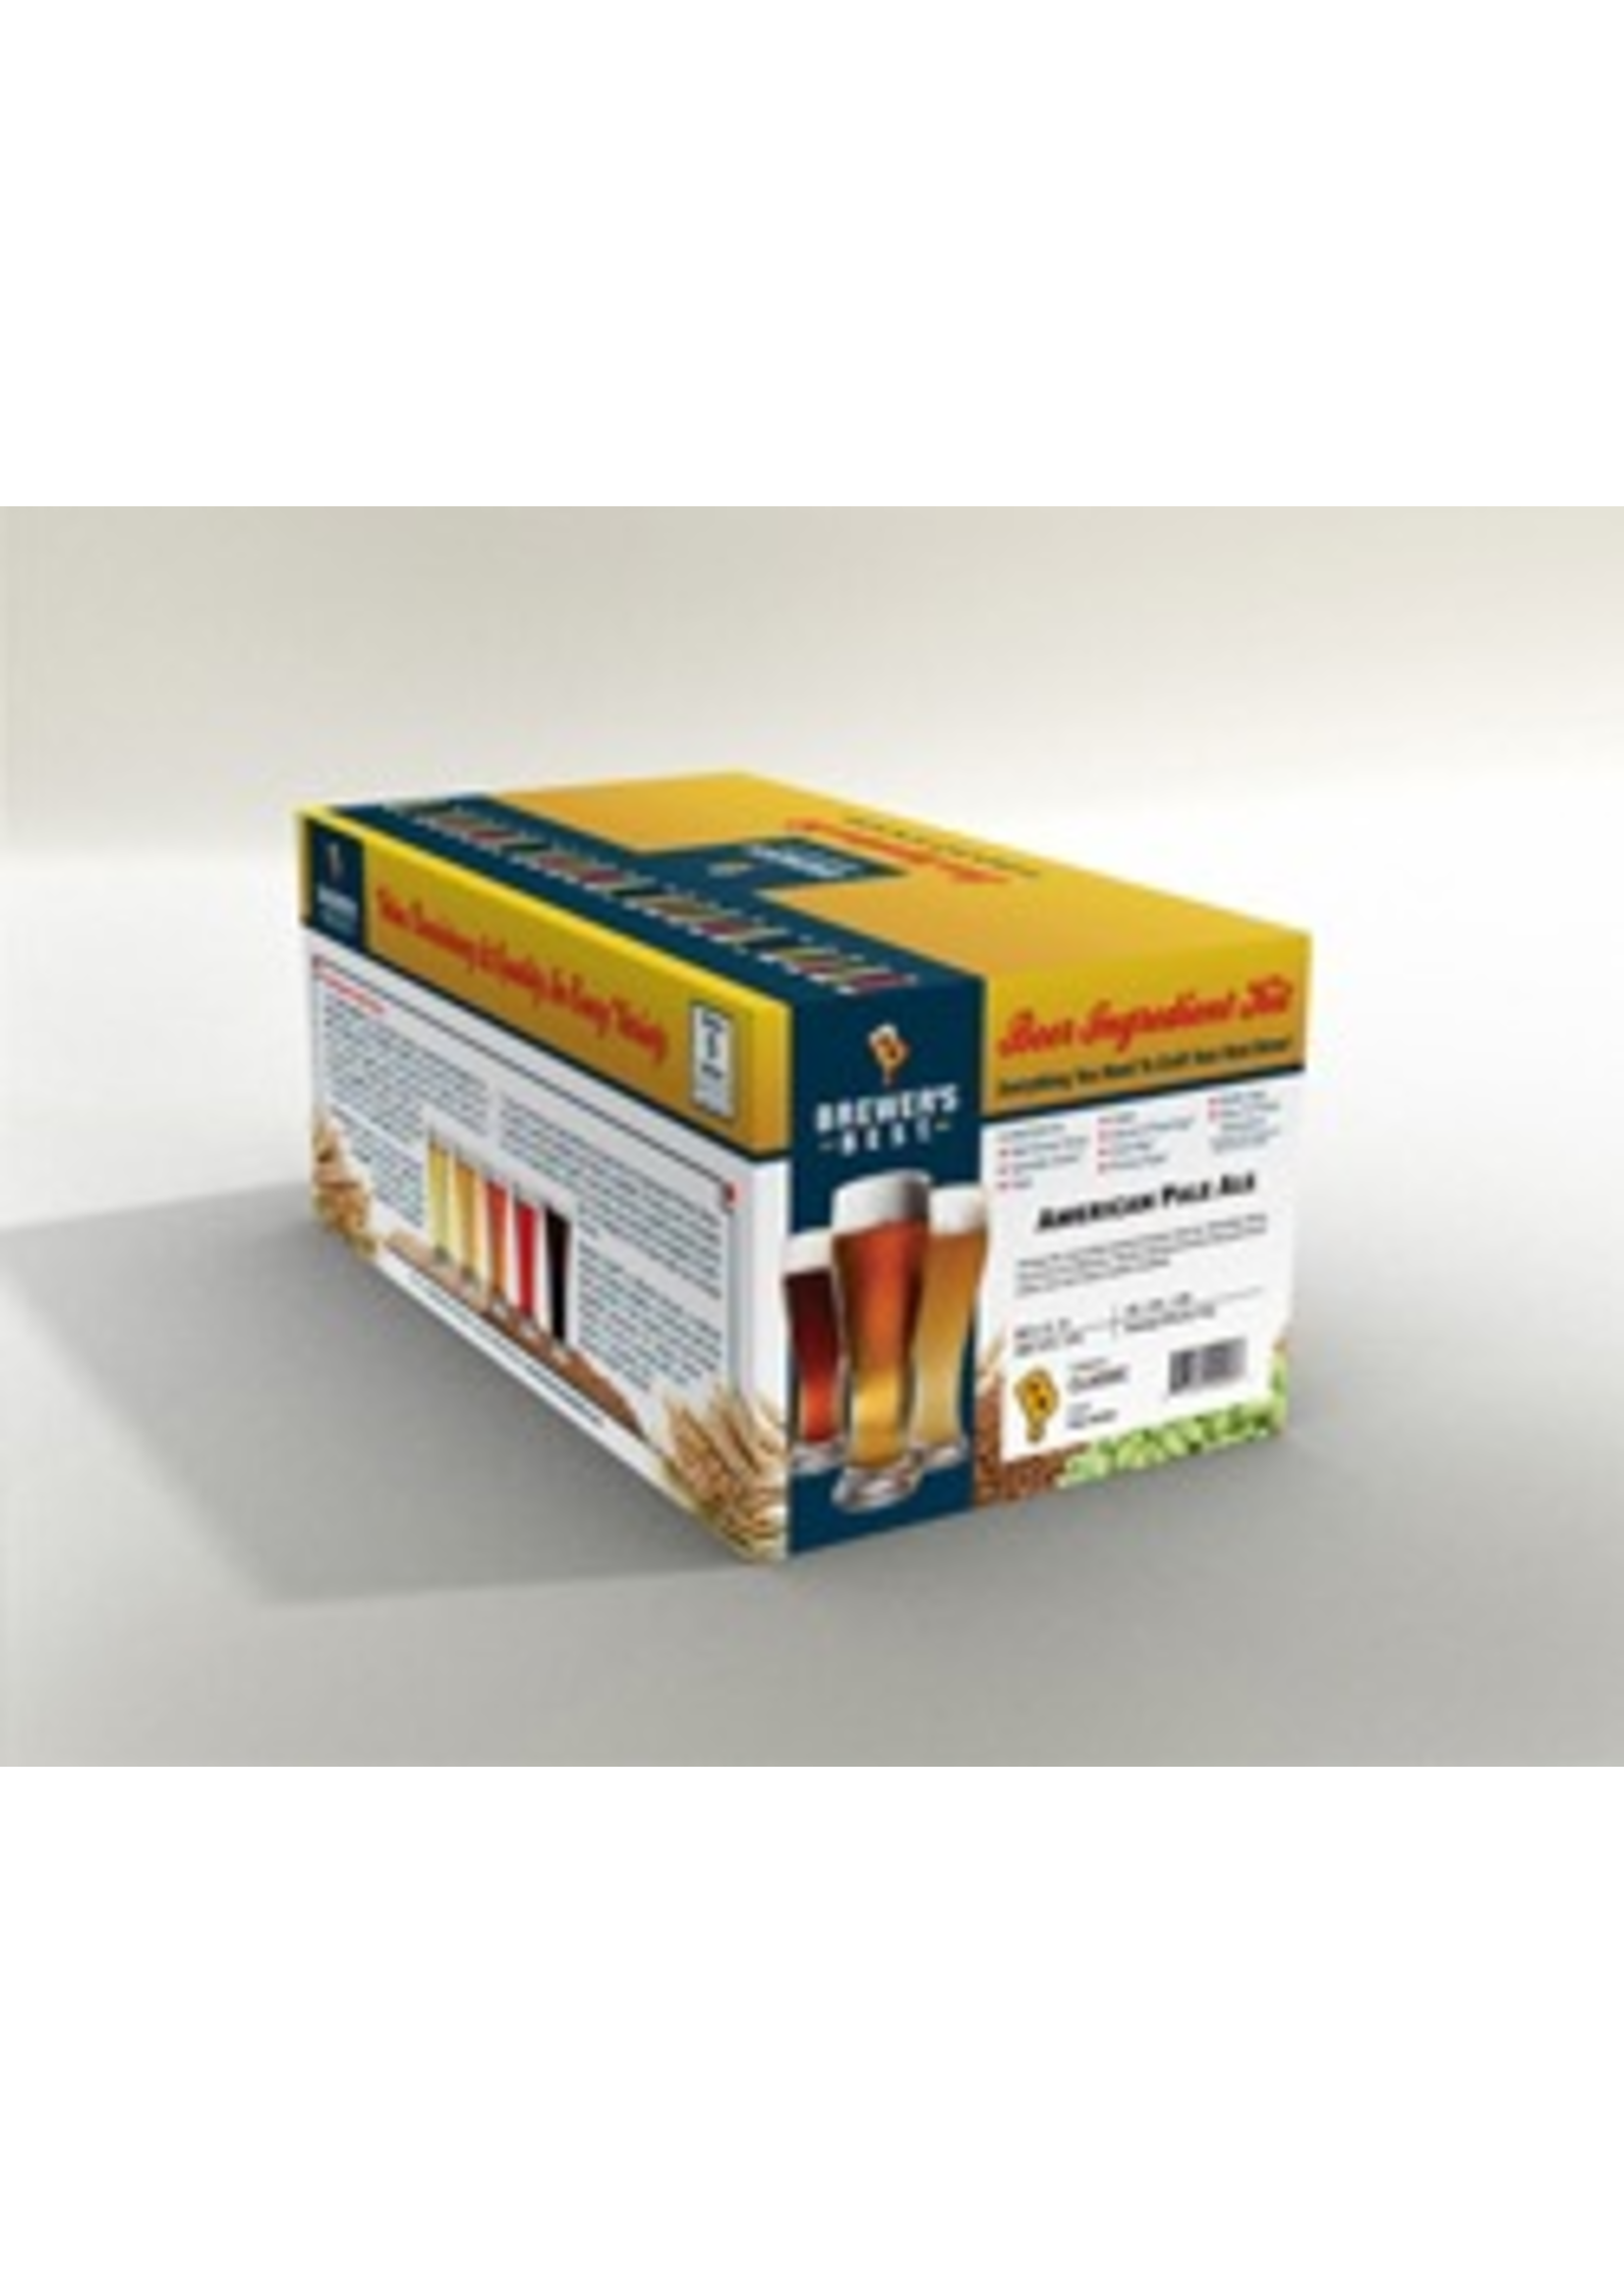 Ingredient Kits Brewer's Best English Brown Ale - 5 Gallon Beer Ingredient Kit